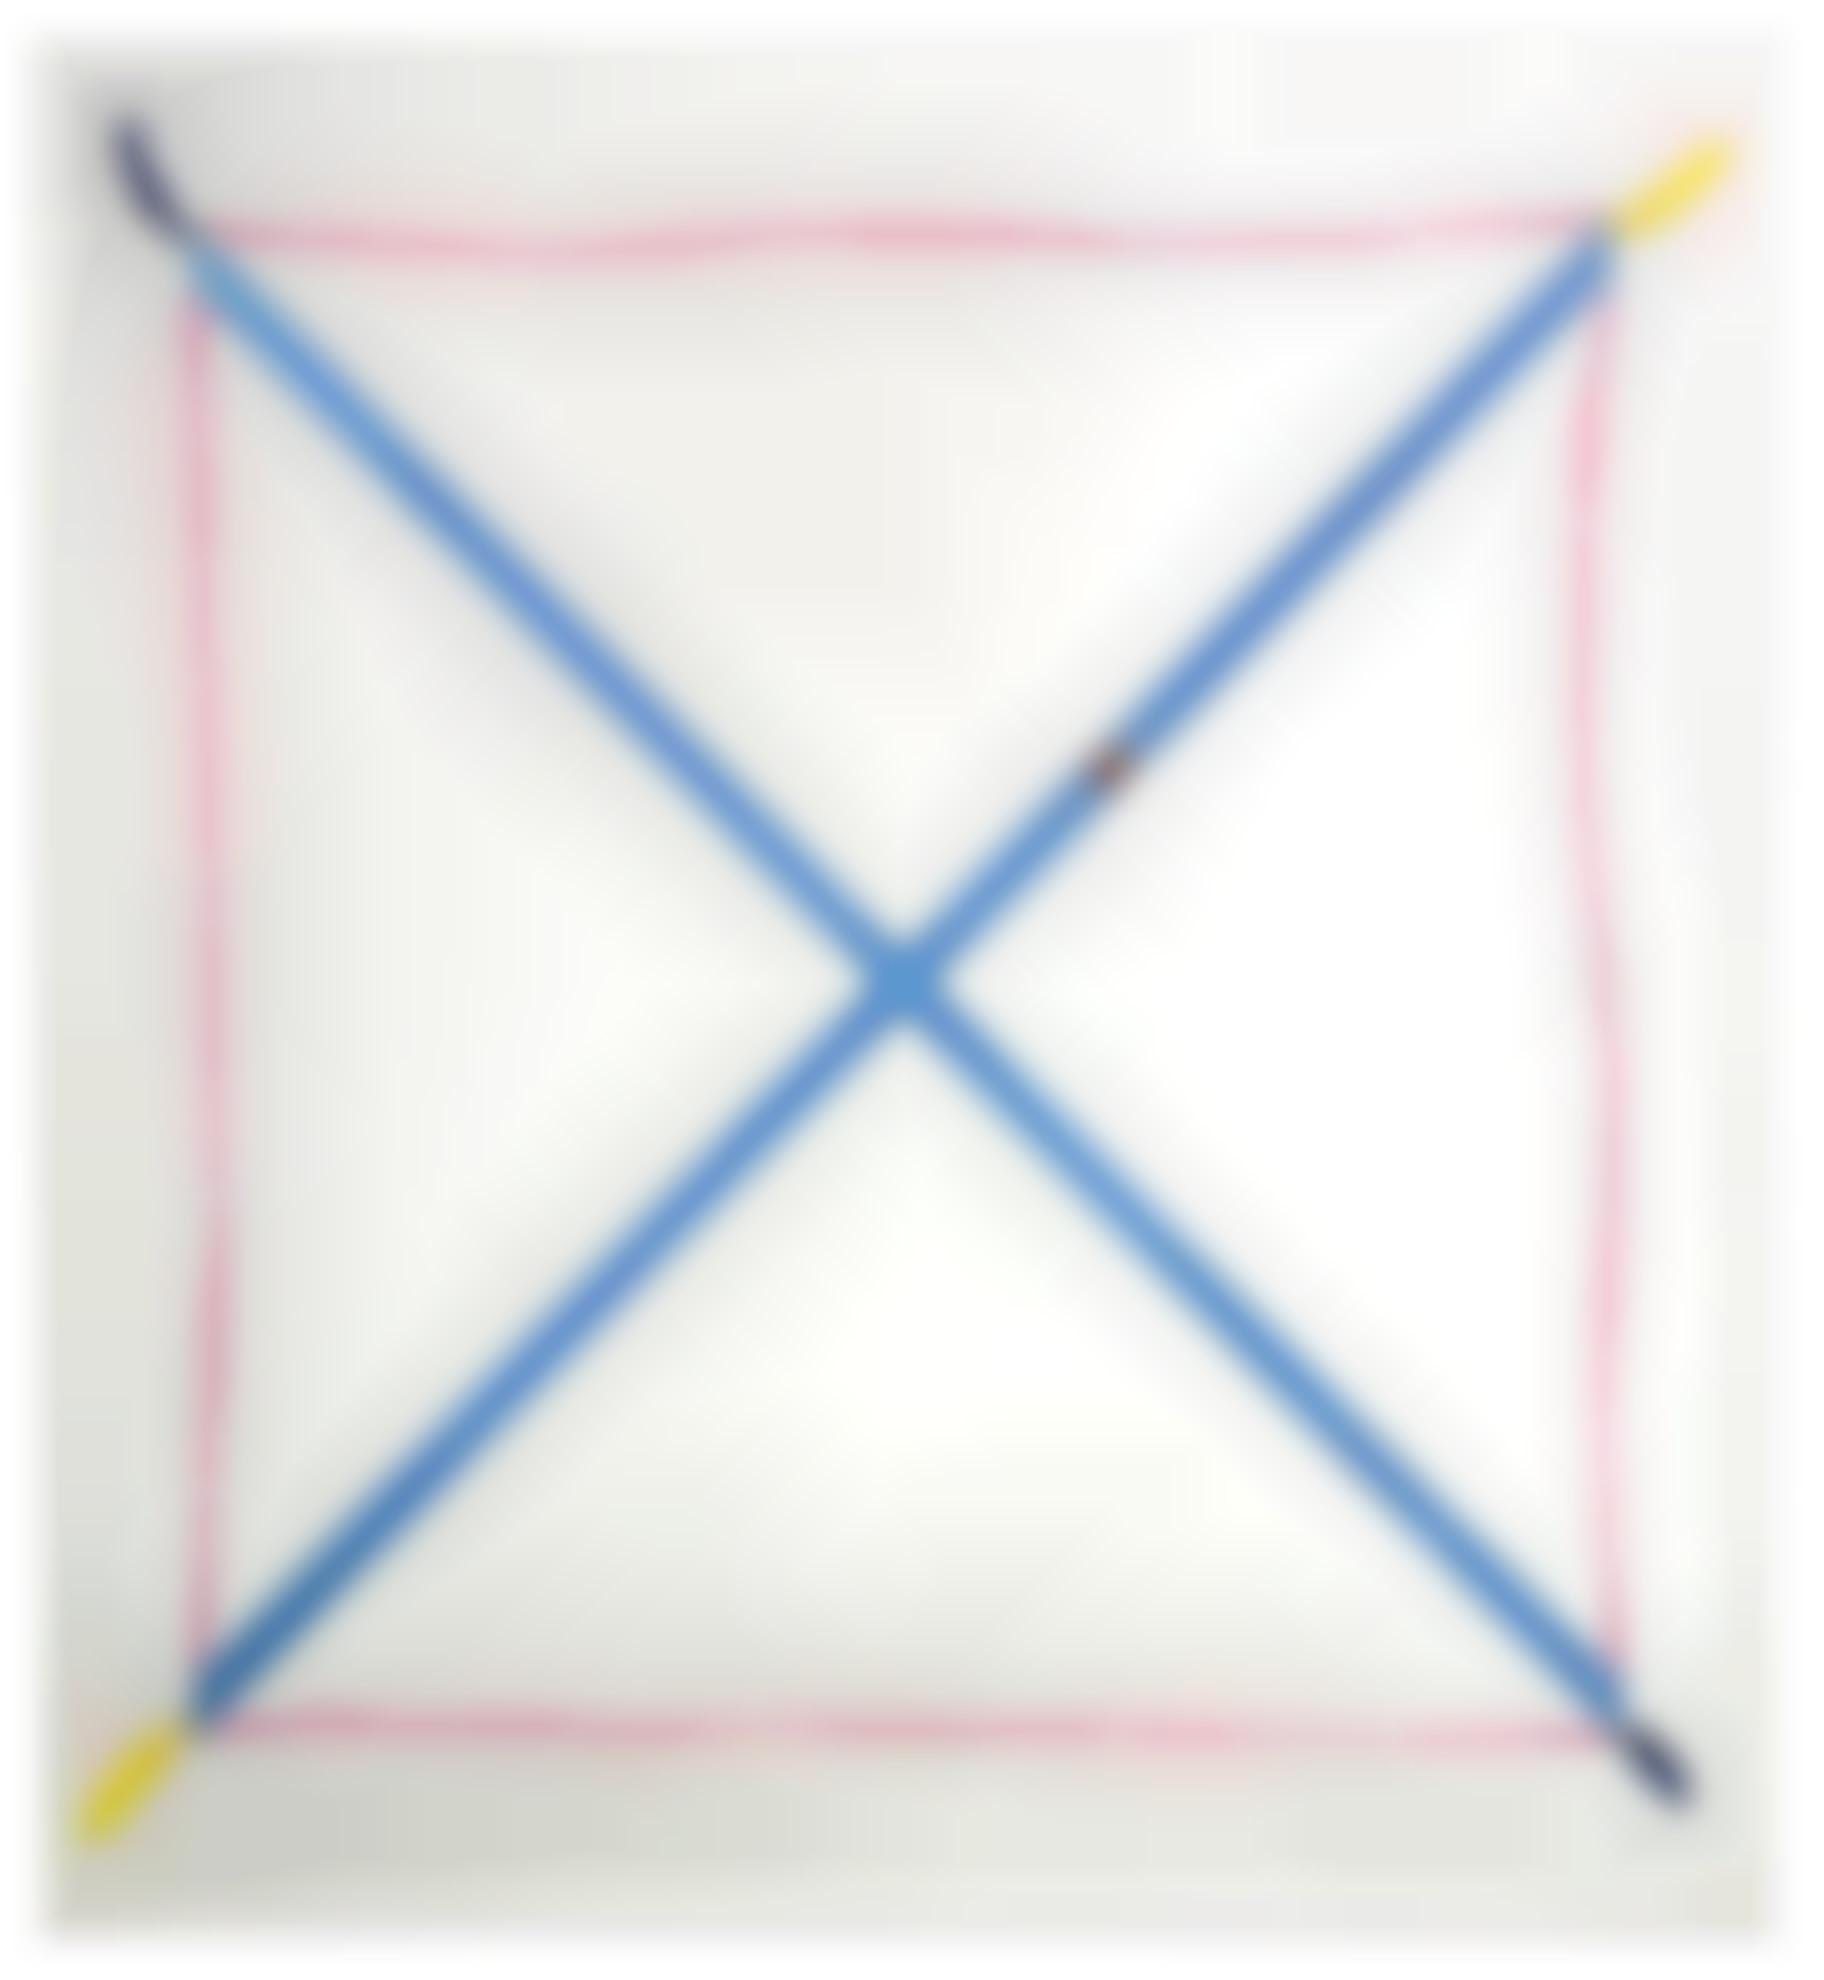 Martial Raysse-Symbole X-1974